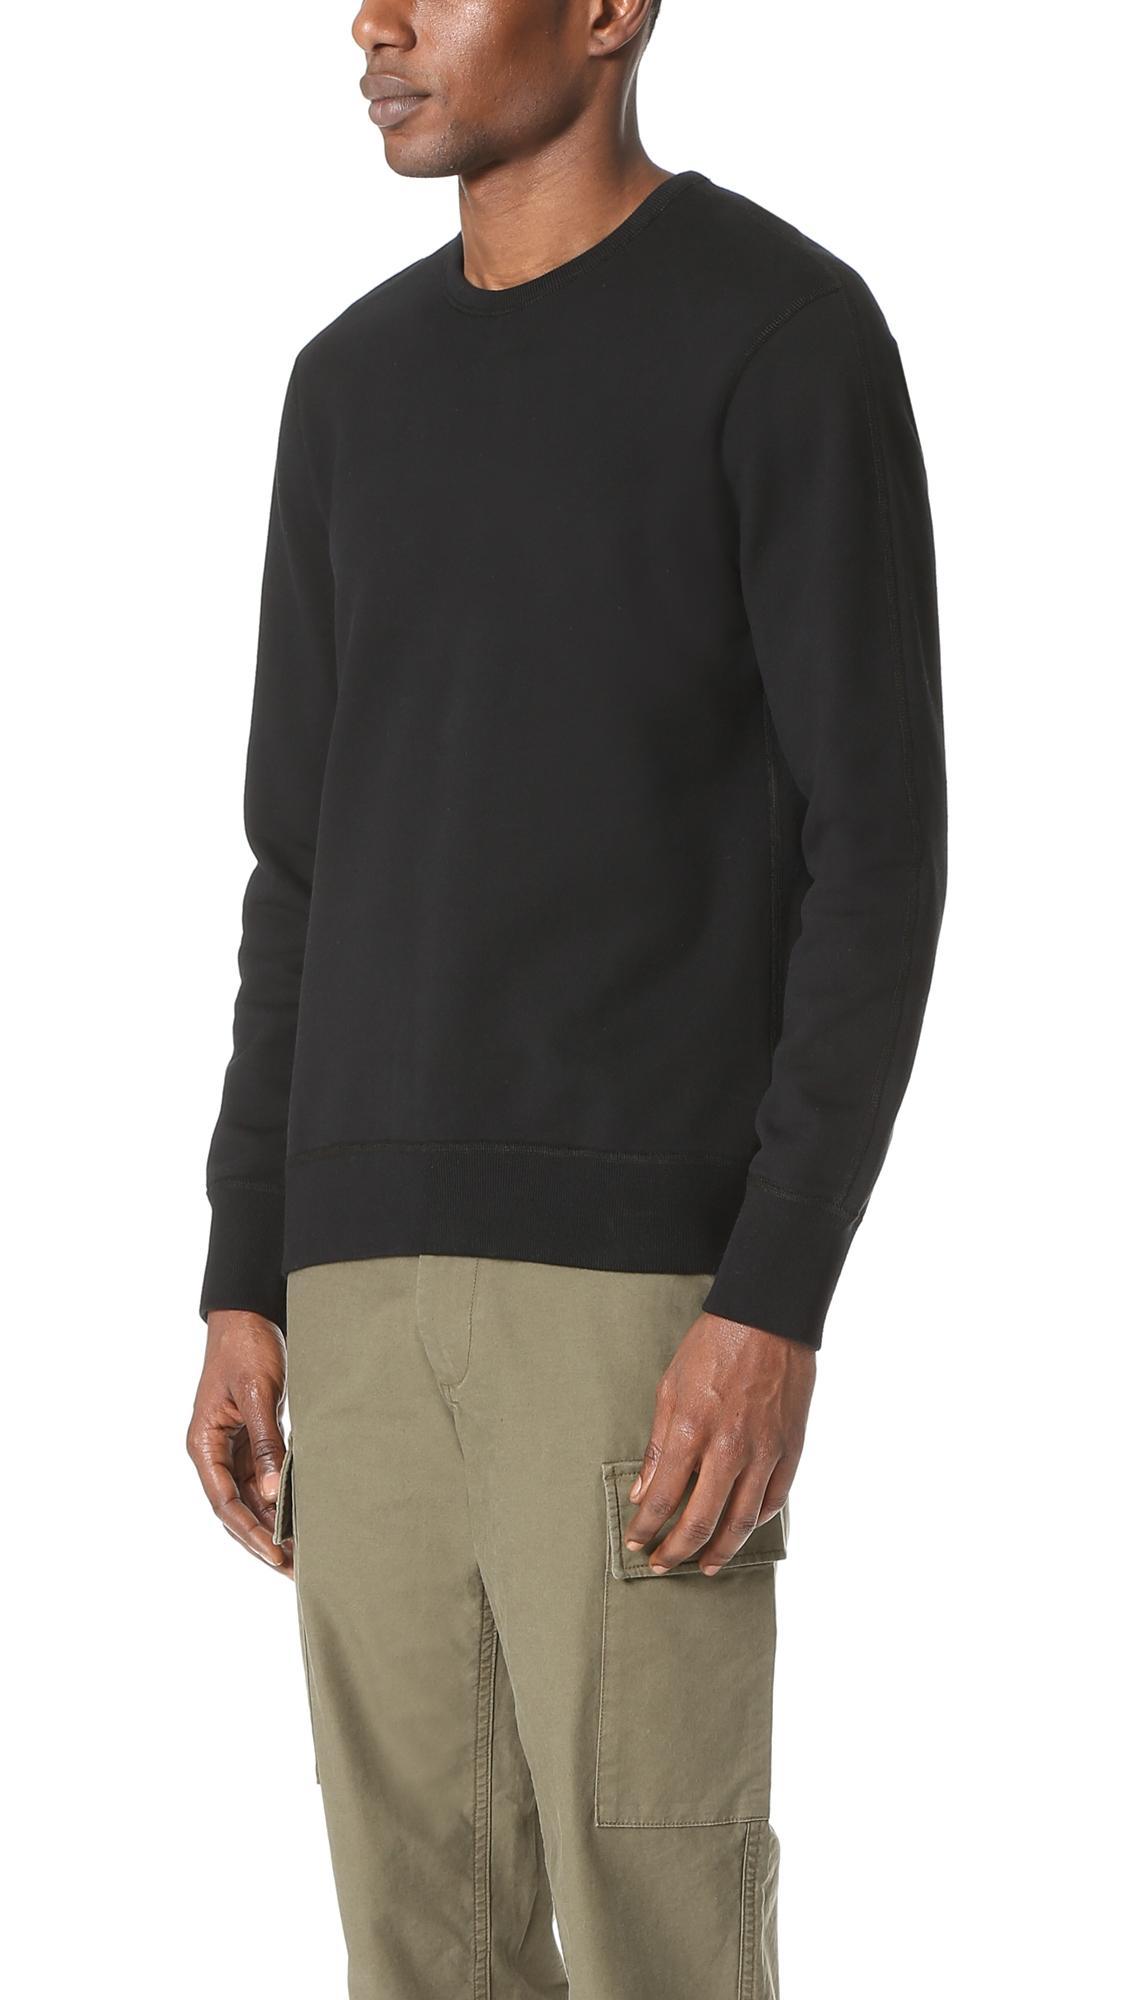 Reigning Champ Cotton Mid Weight Terry Side Zip Crew Sweatshirt in Black for Men